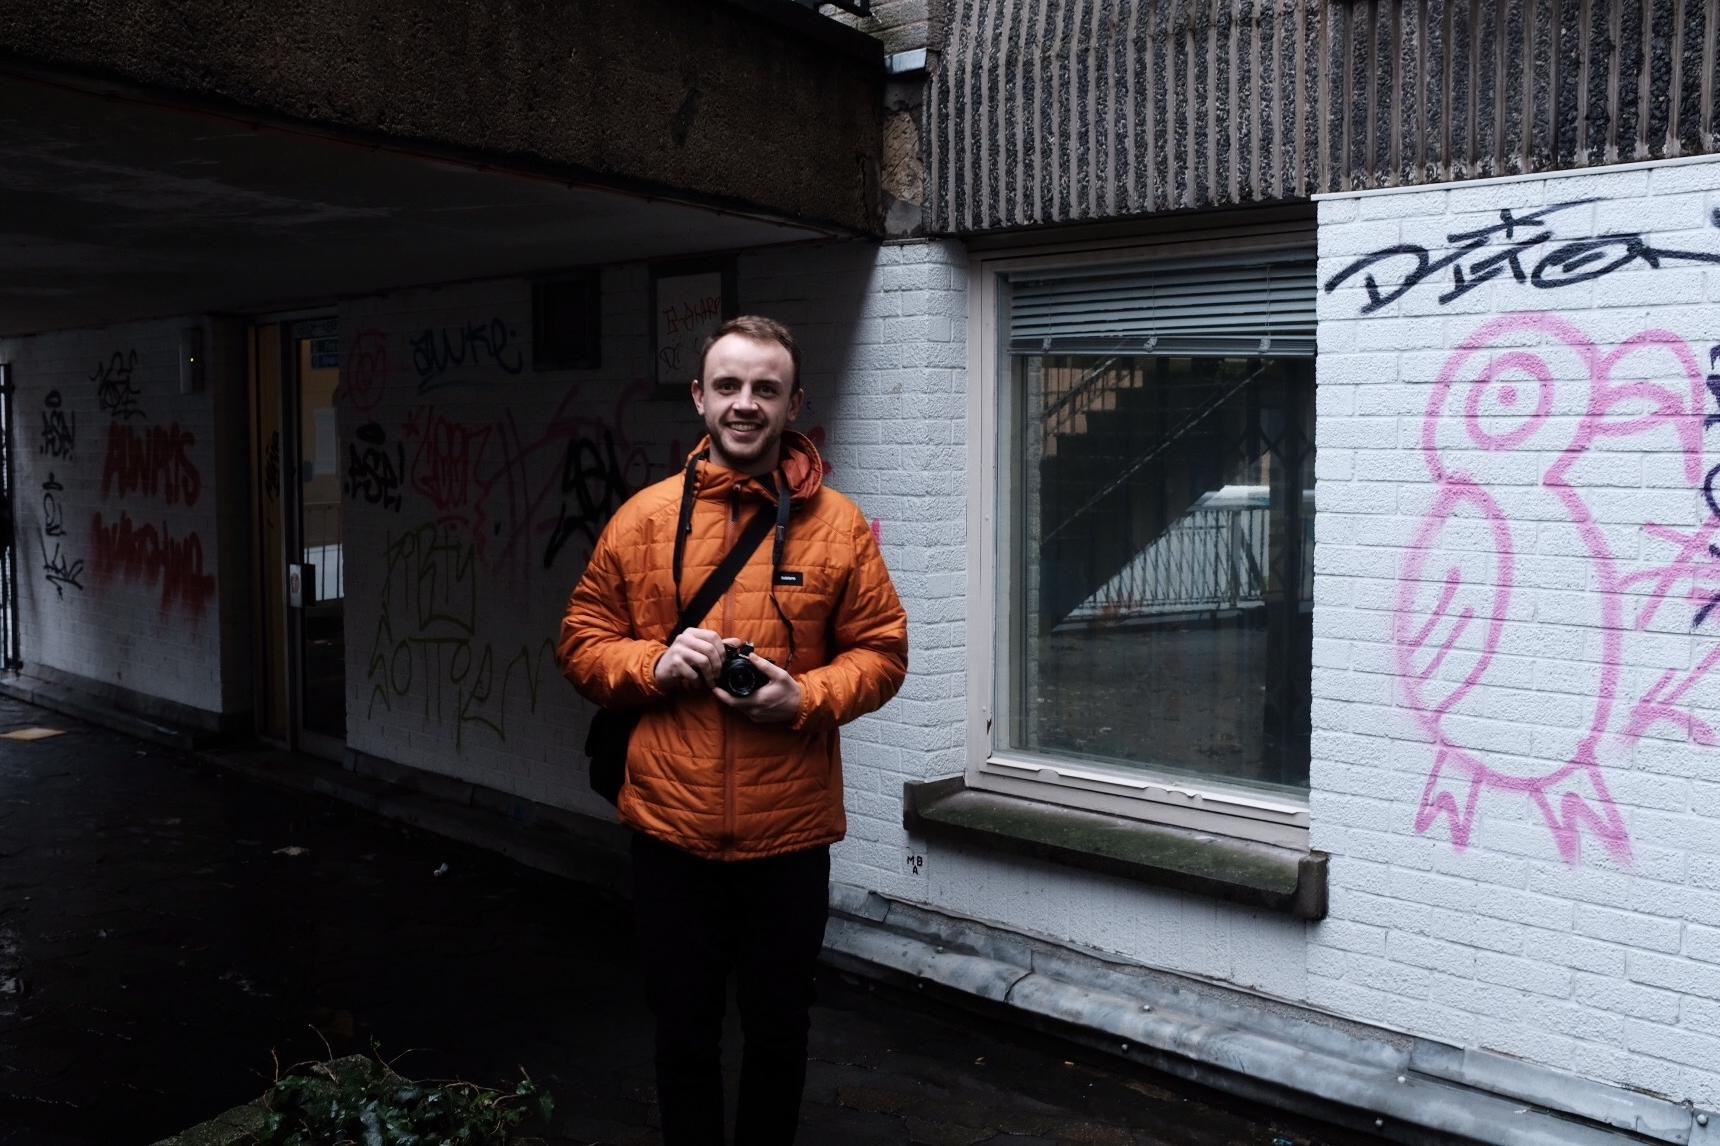 Alex-Sedgmond-Photography-Cardiff-Bristol-StreetPhotography-portrait.JPG